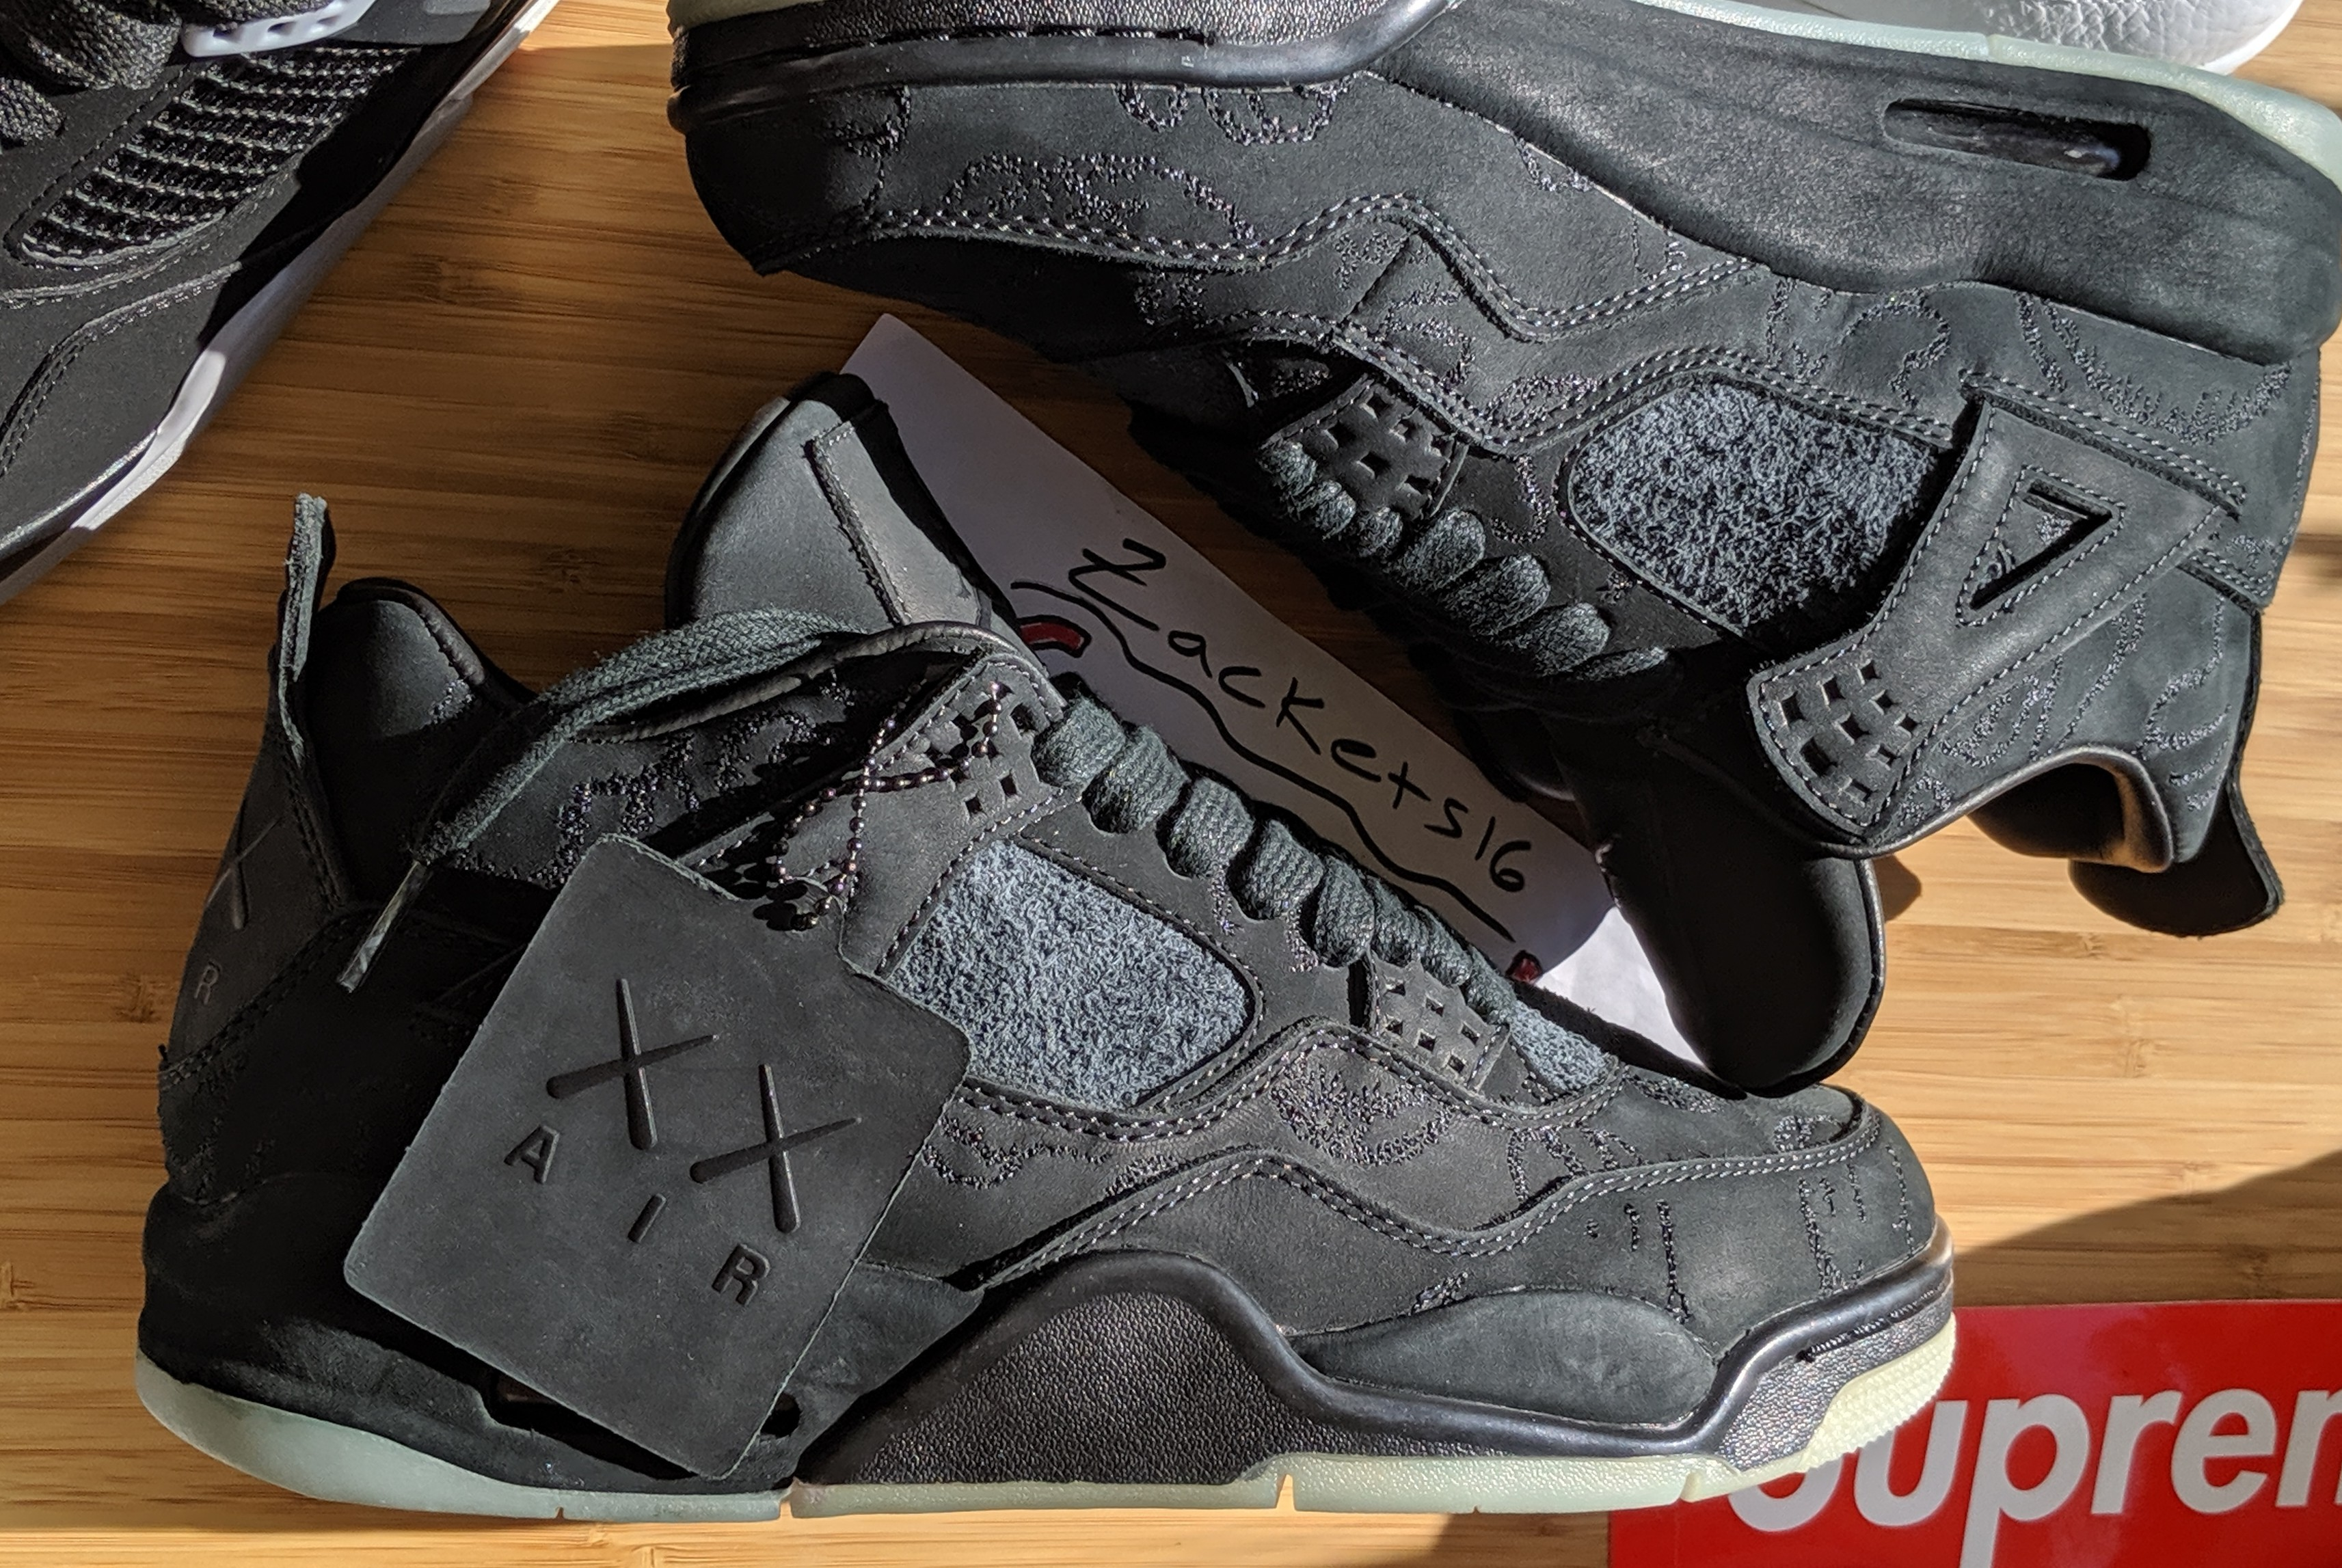 c988fc622a6 Jordan Brand Ds Kaws X Air Jordan 4 Black Sz. 9 Comes With Og ...